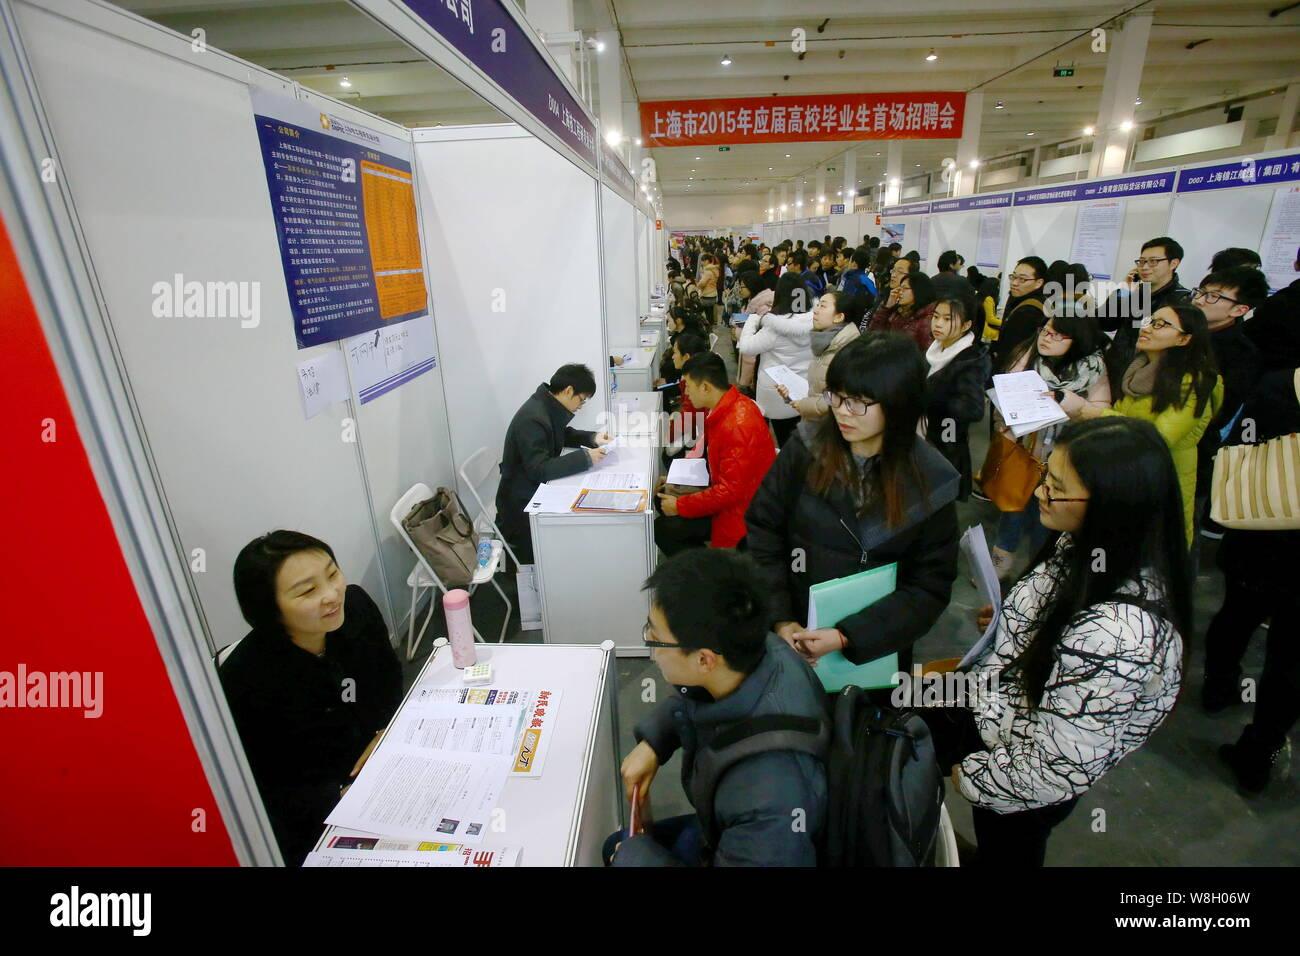 Recruiters Stock Photos & Recruiters Stock Images - Alamy